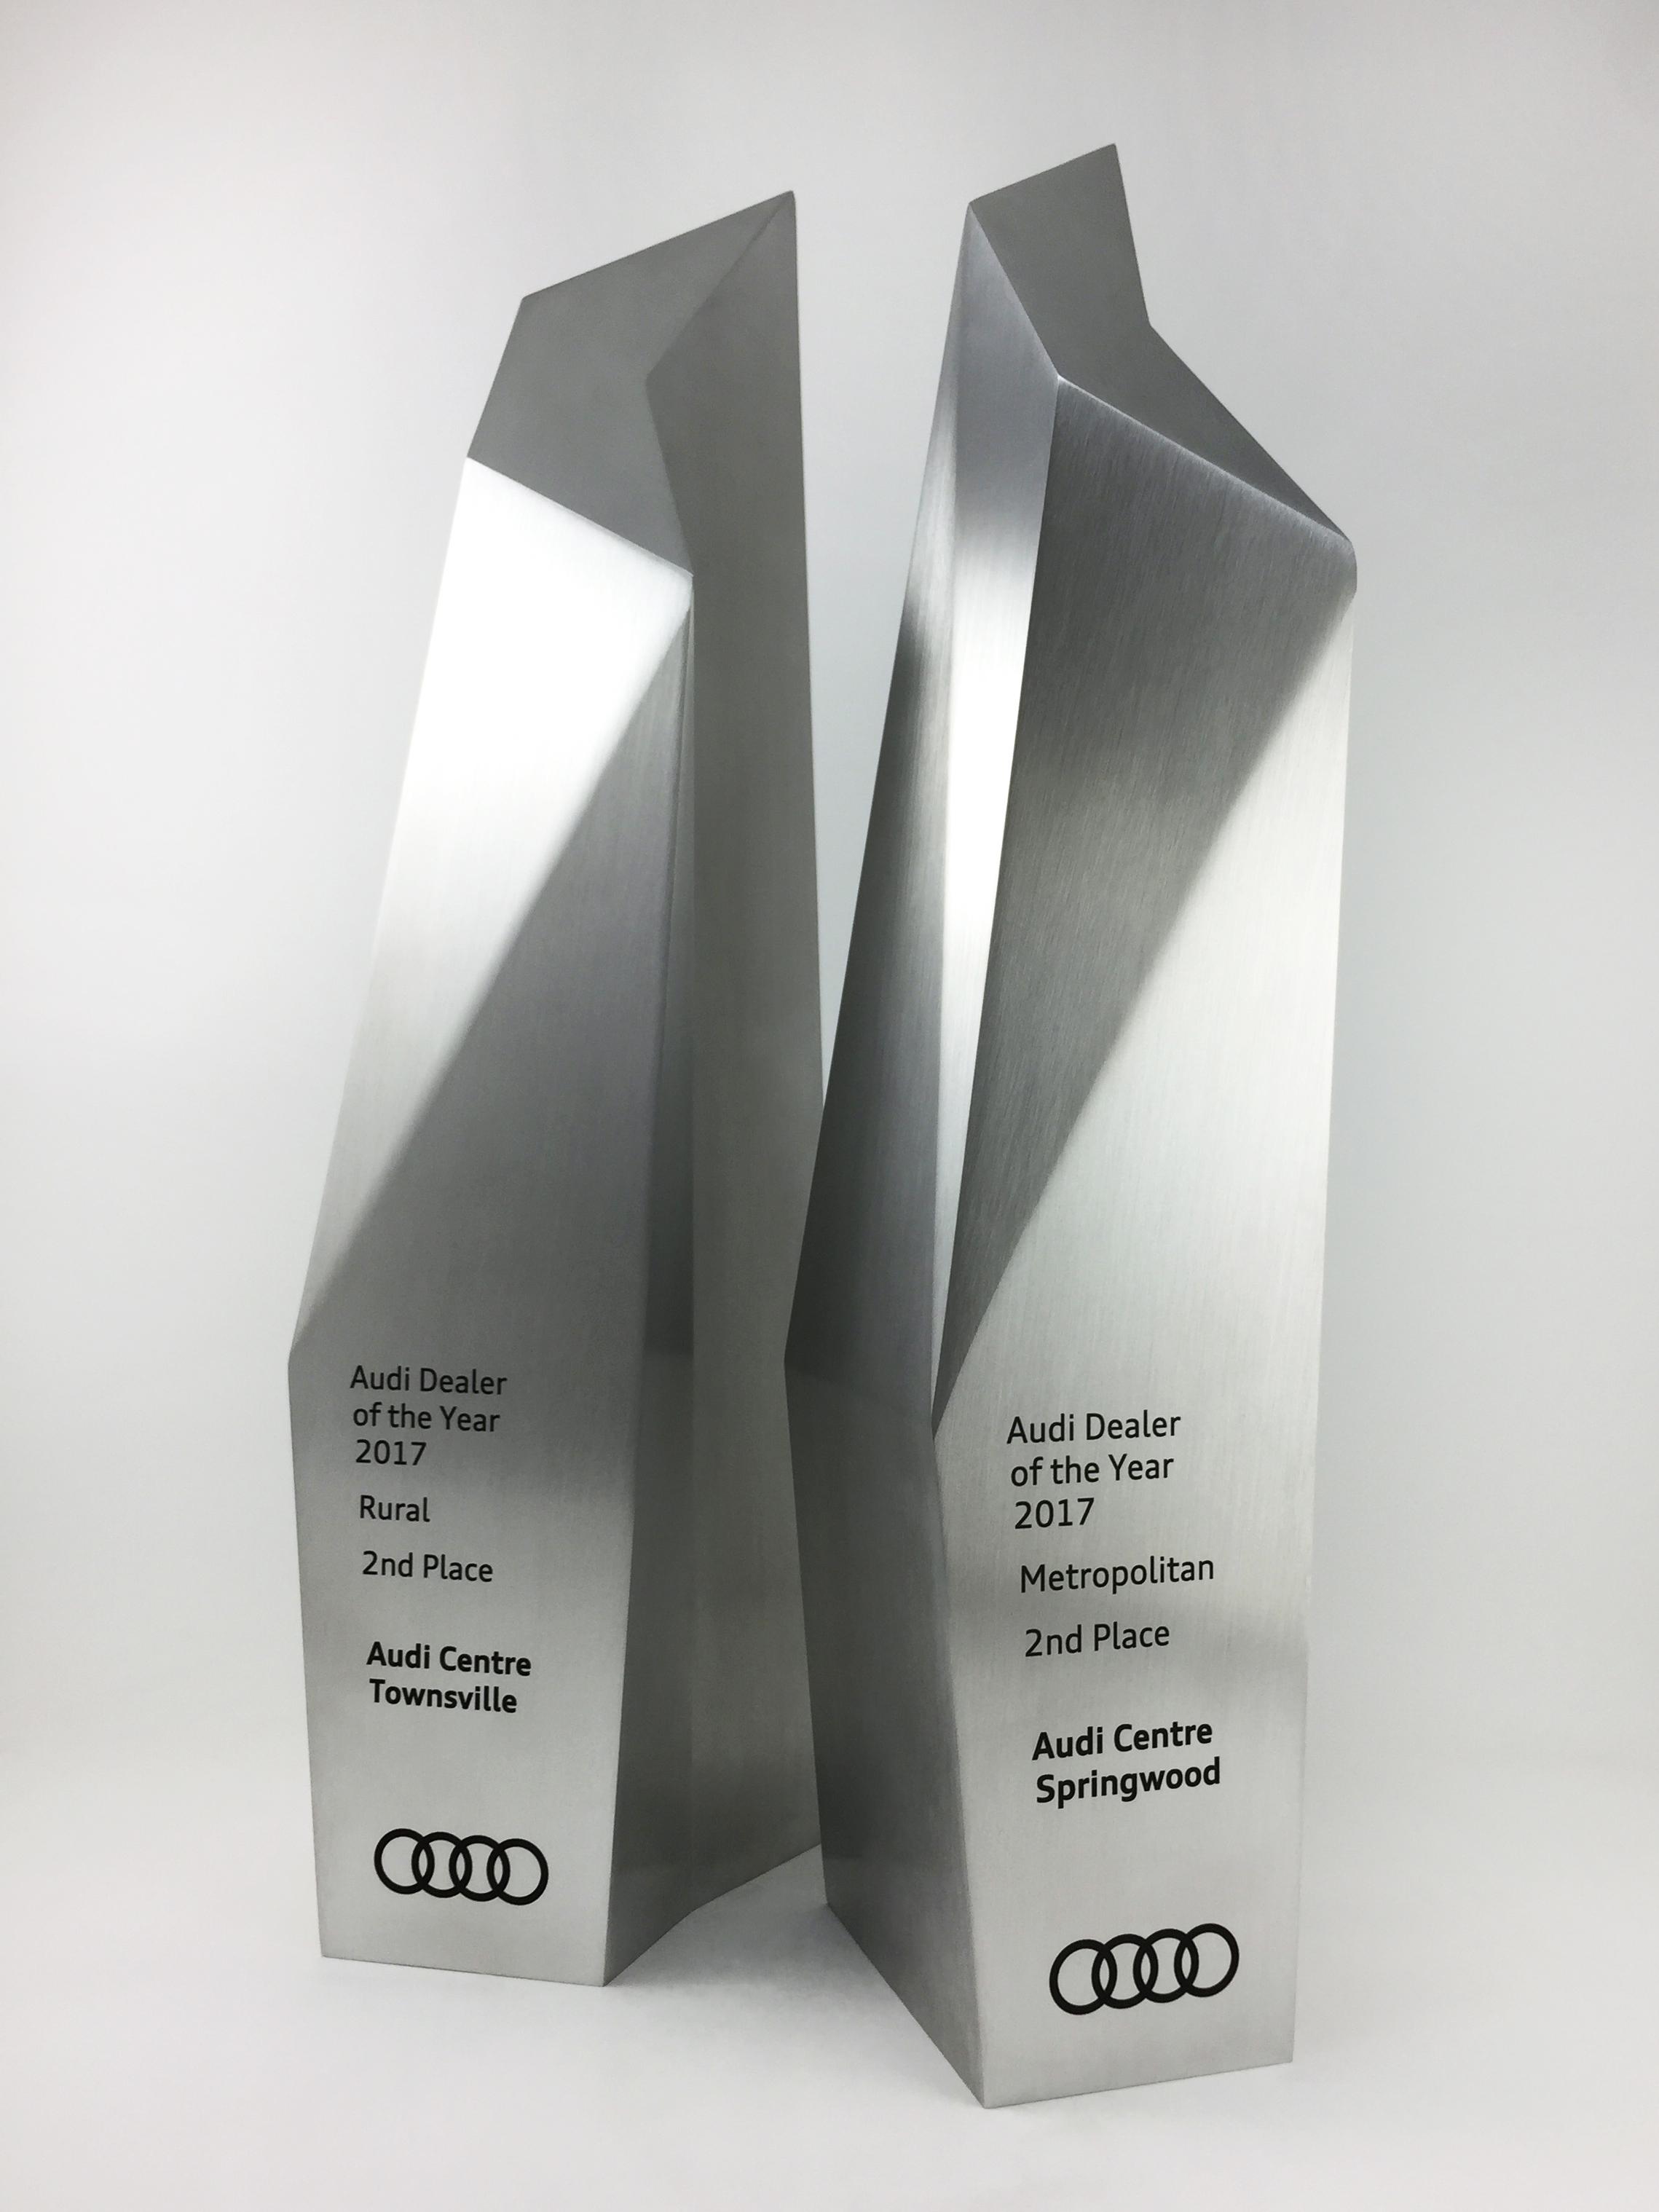 audi-metal-art-sculpture-award-trophy-05 copy.jpg